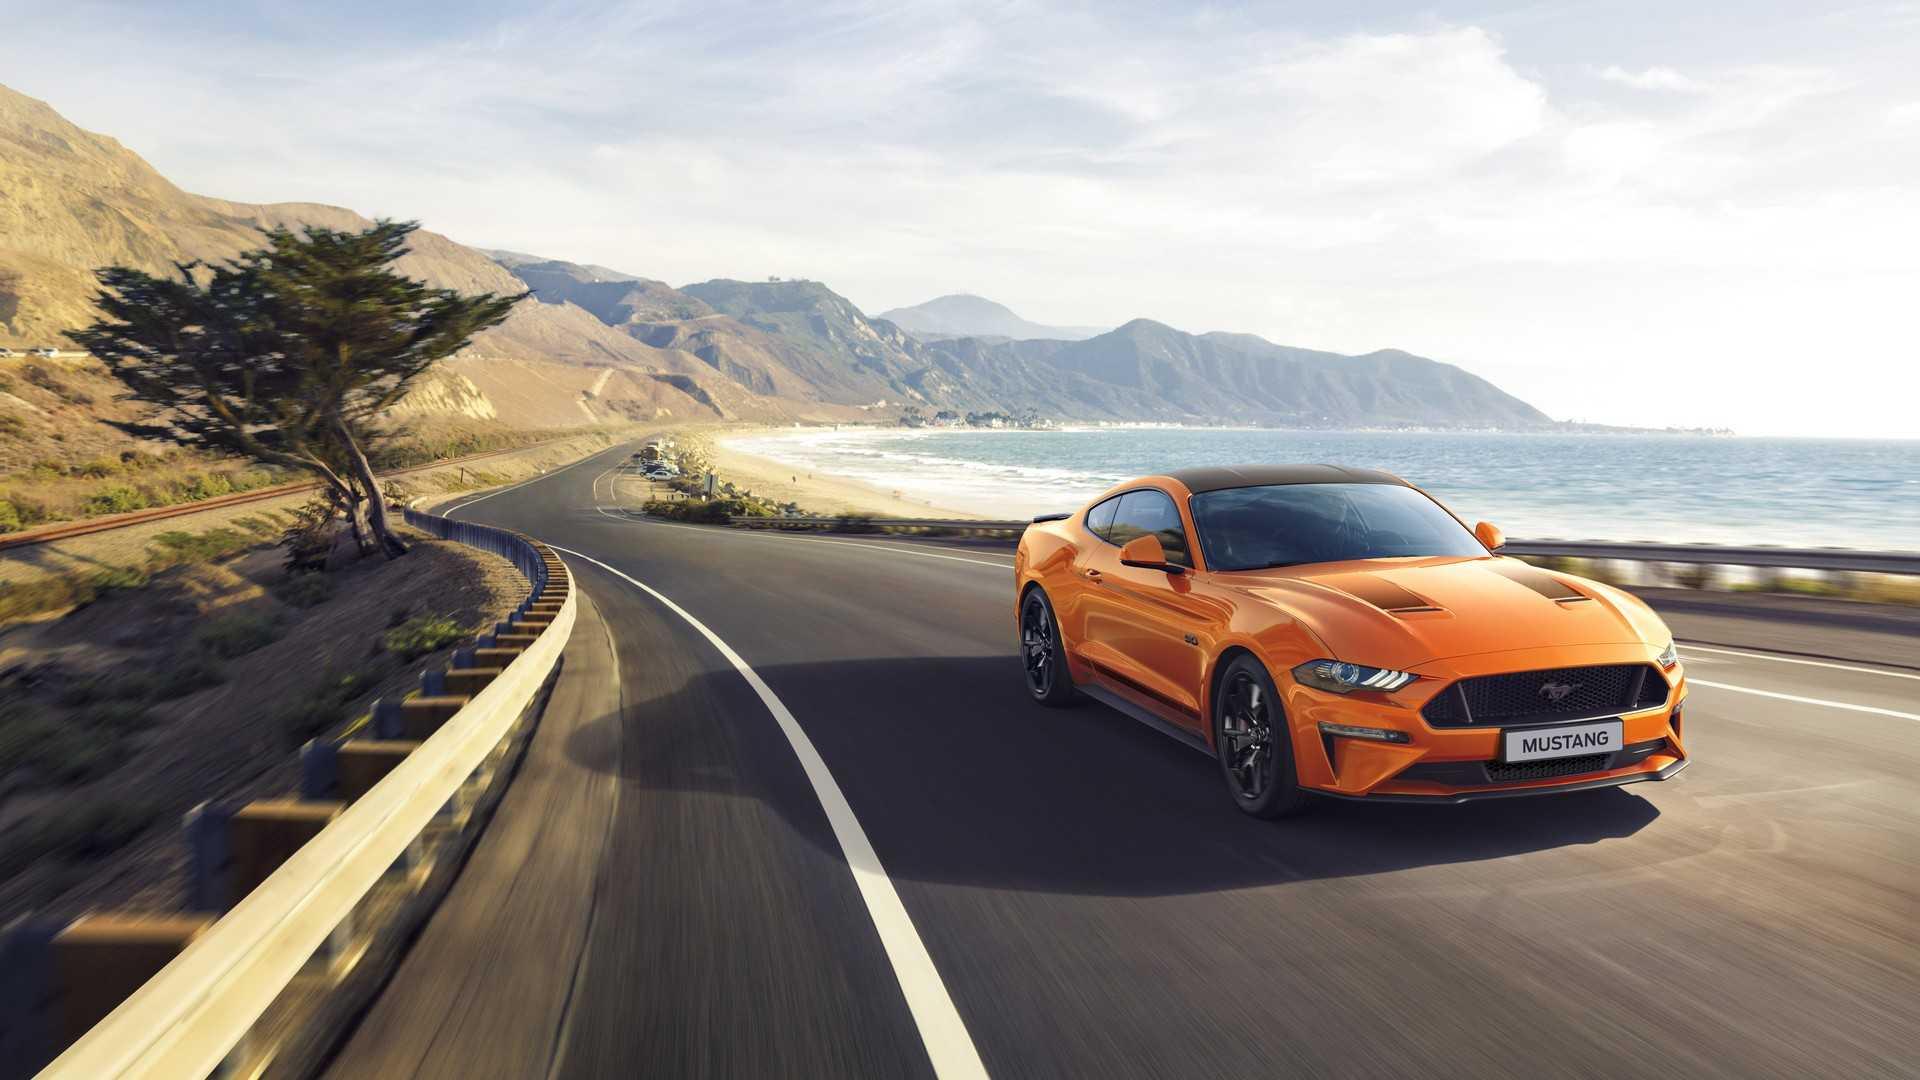 Ford поздравит европейцев с юбилеем «Мустанга» 1